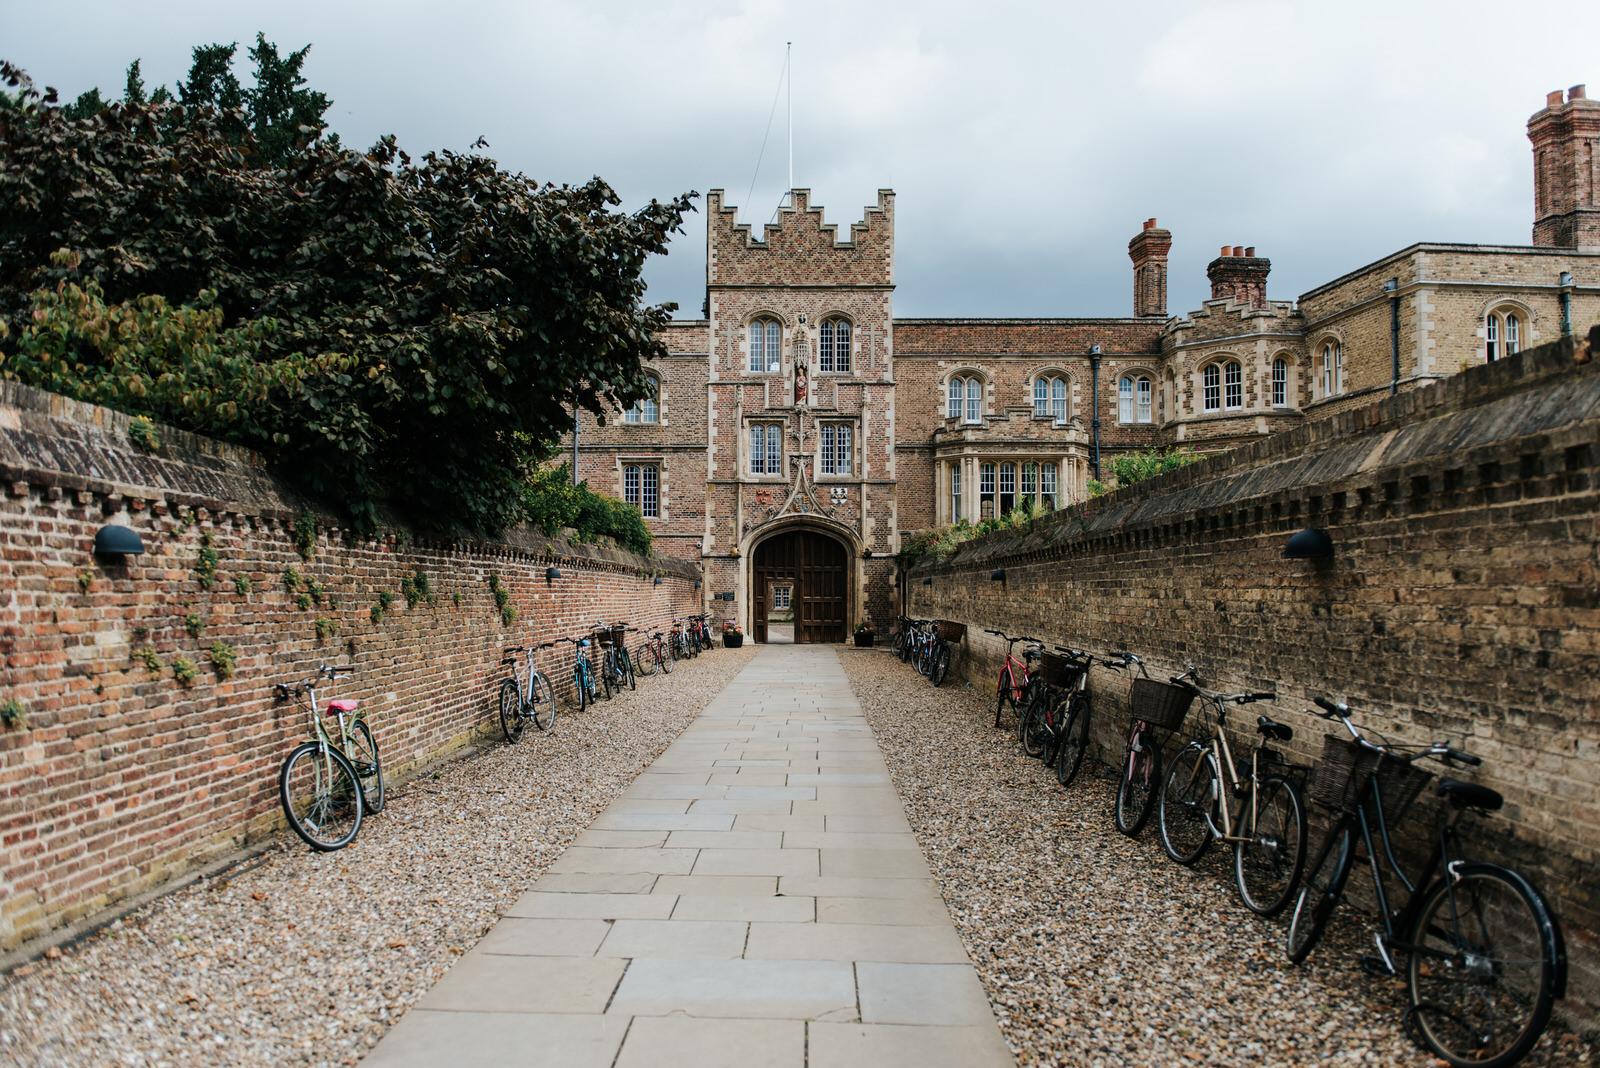 Jesus College Cambridge exterior shot of entrance